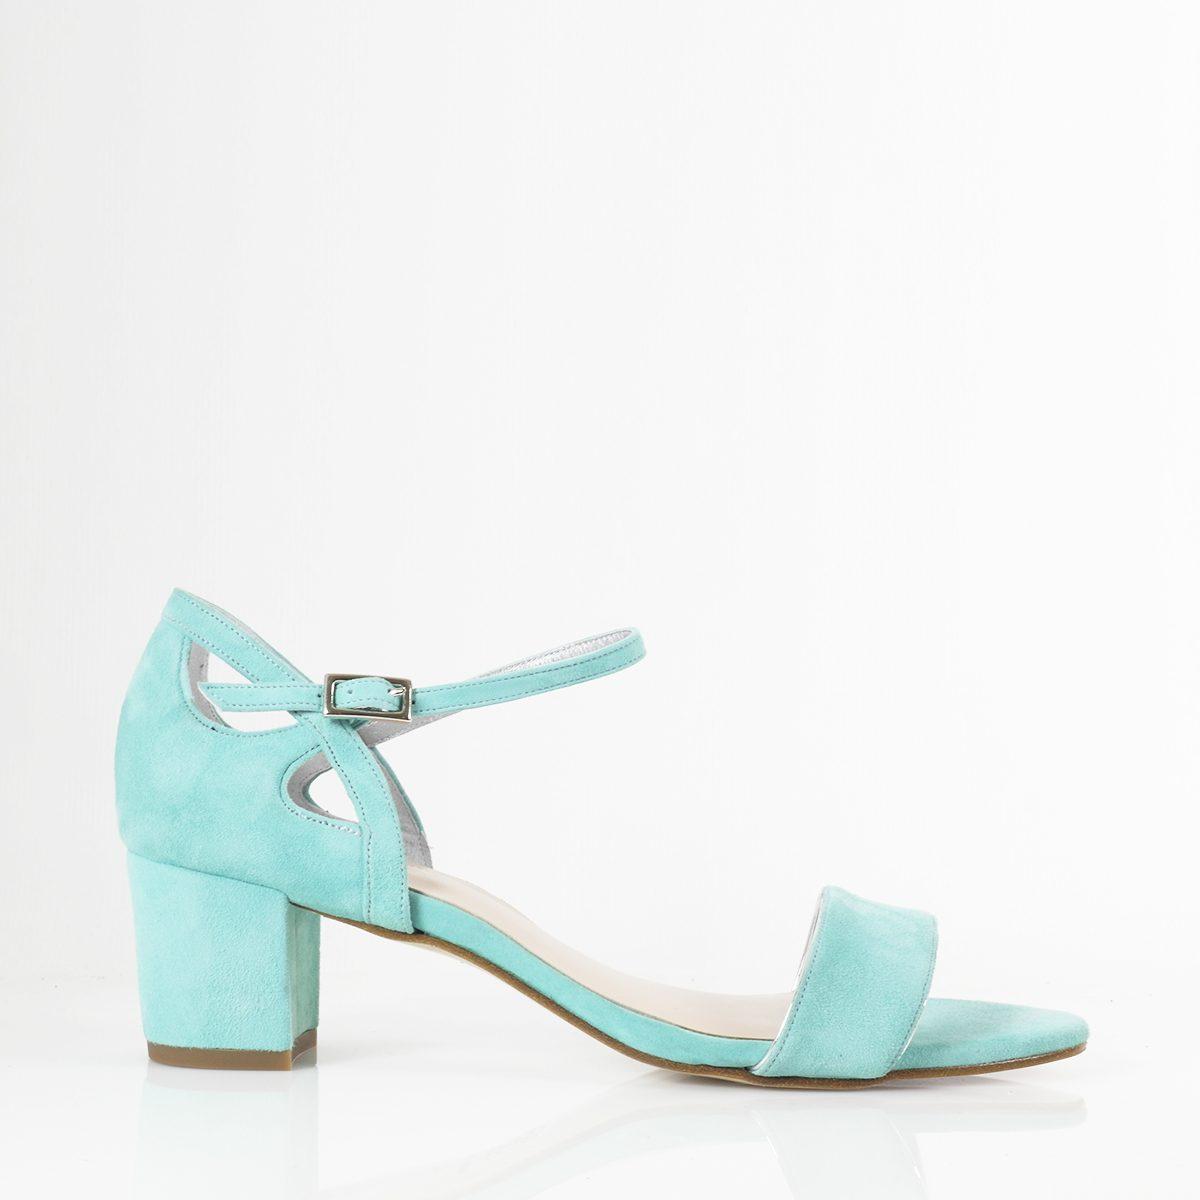 SANDALIA MOD.1378 (4cm) - zapatos personalizados fiesta